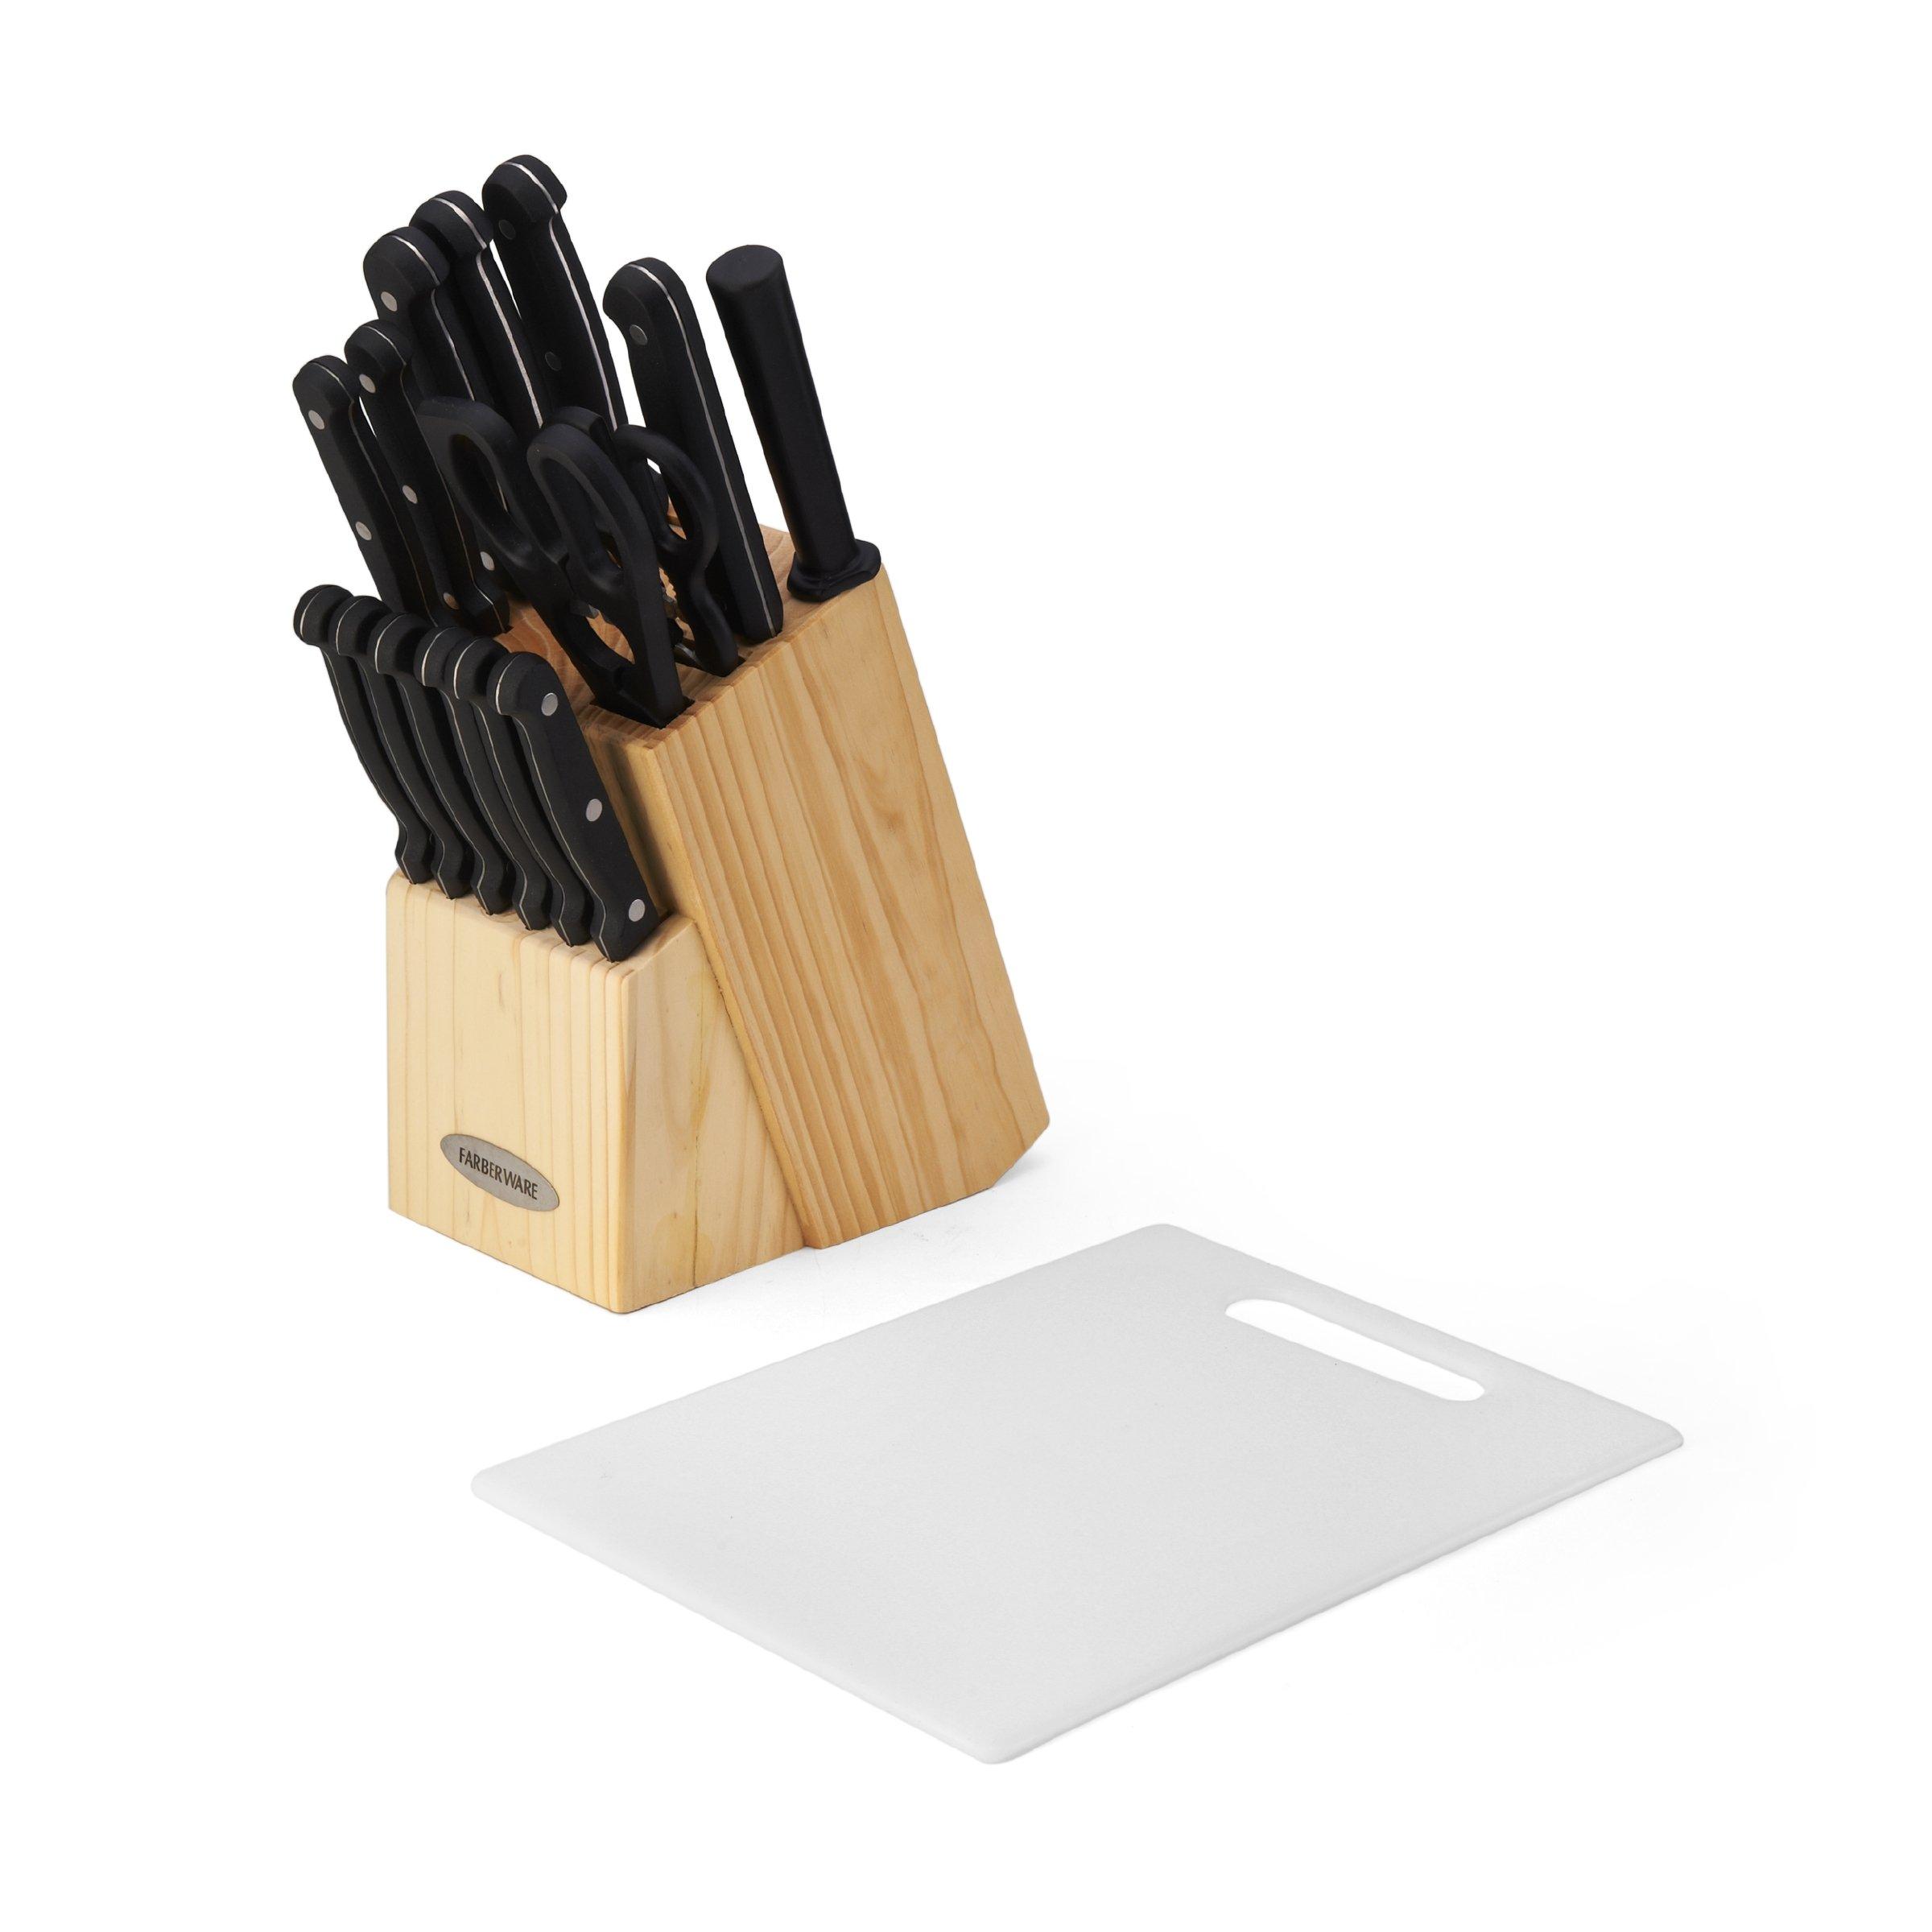 Farberware 5105225 17-Piece Triple Rivet High-Carbon Stainless Steel Knife Block Set with Plastic Cutting Board, Beechwood/Black